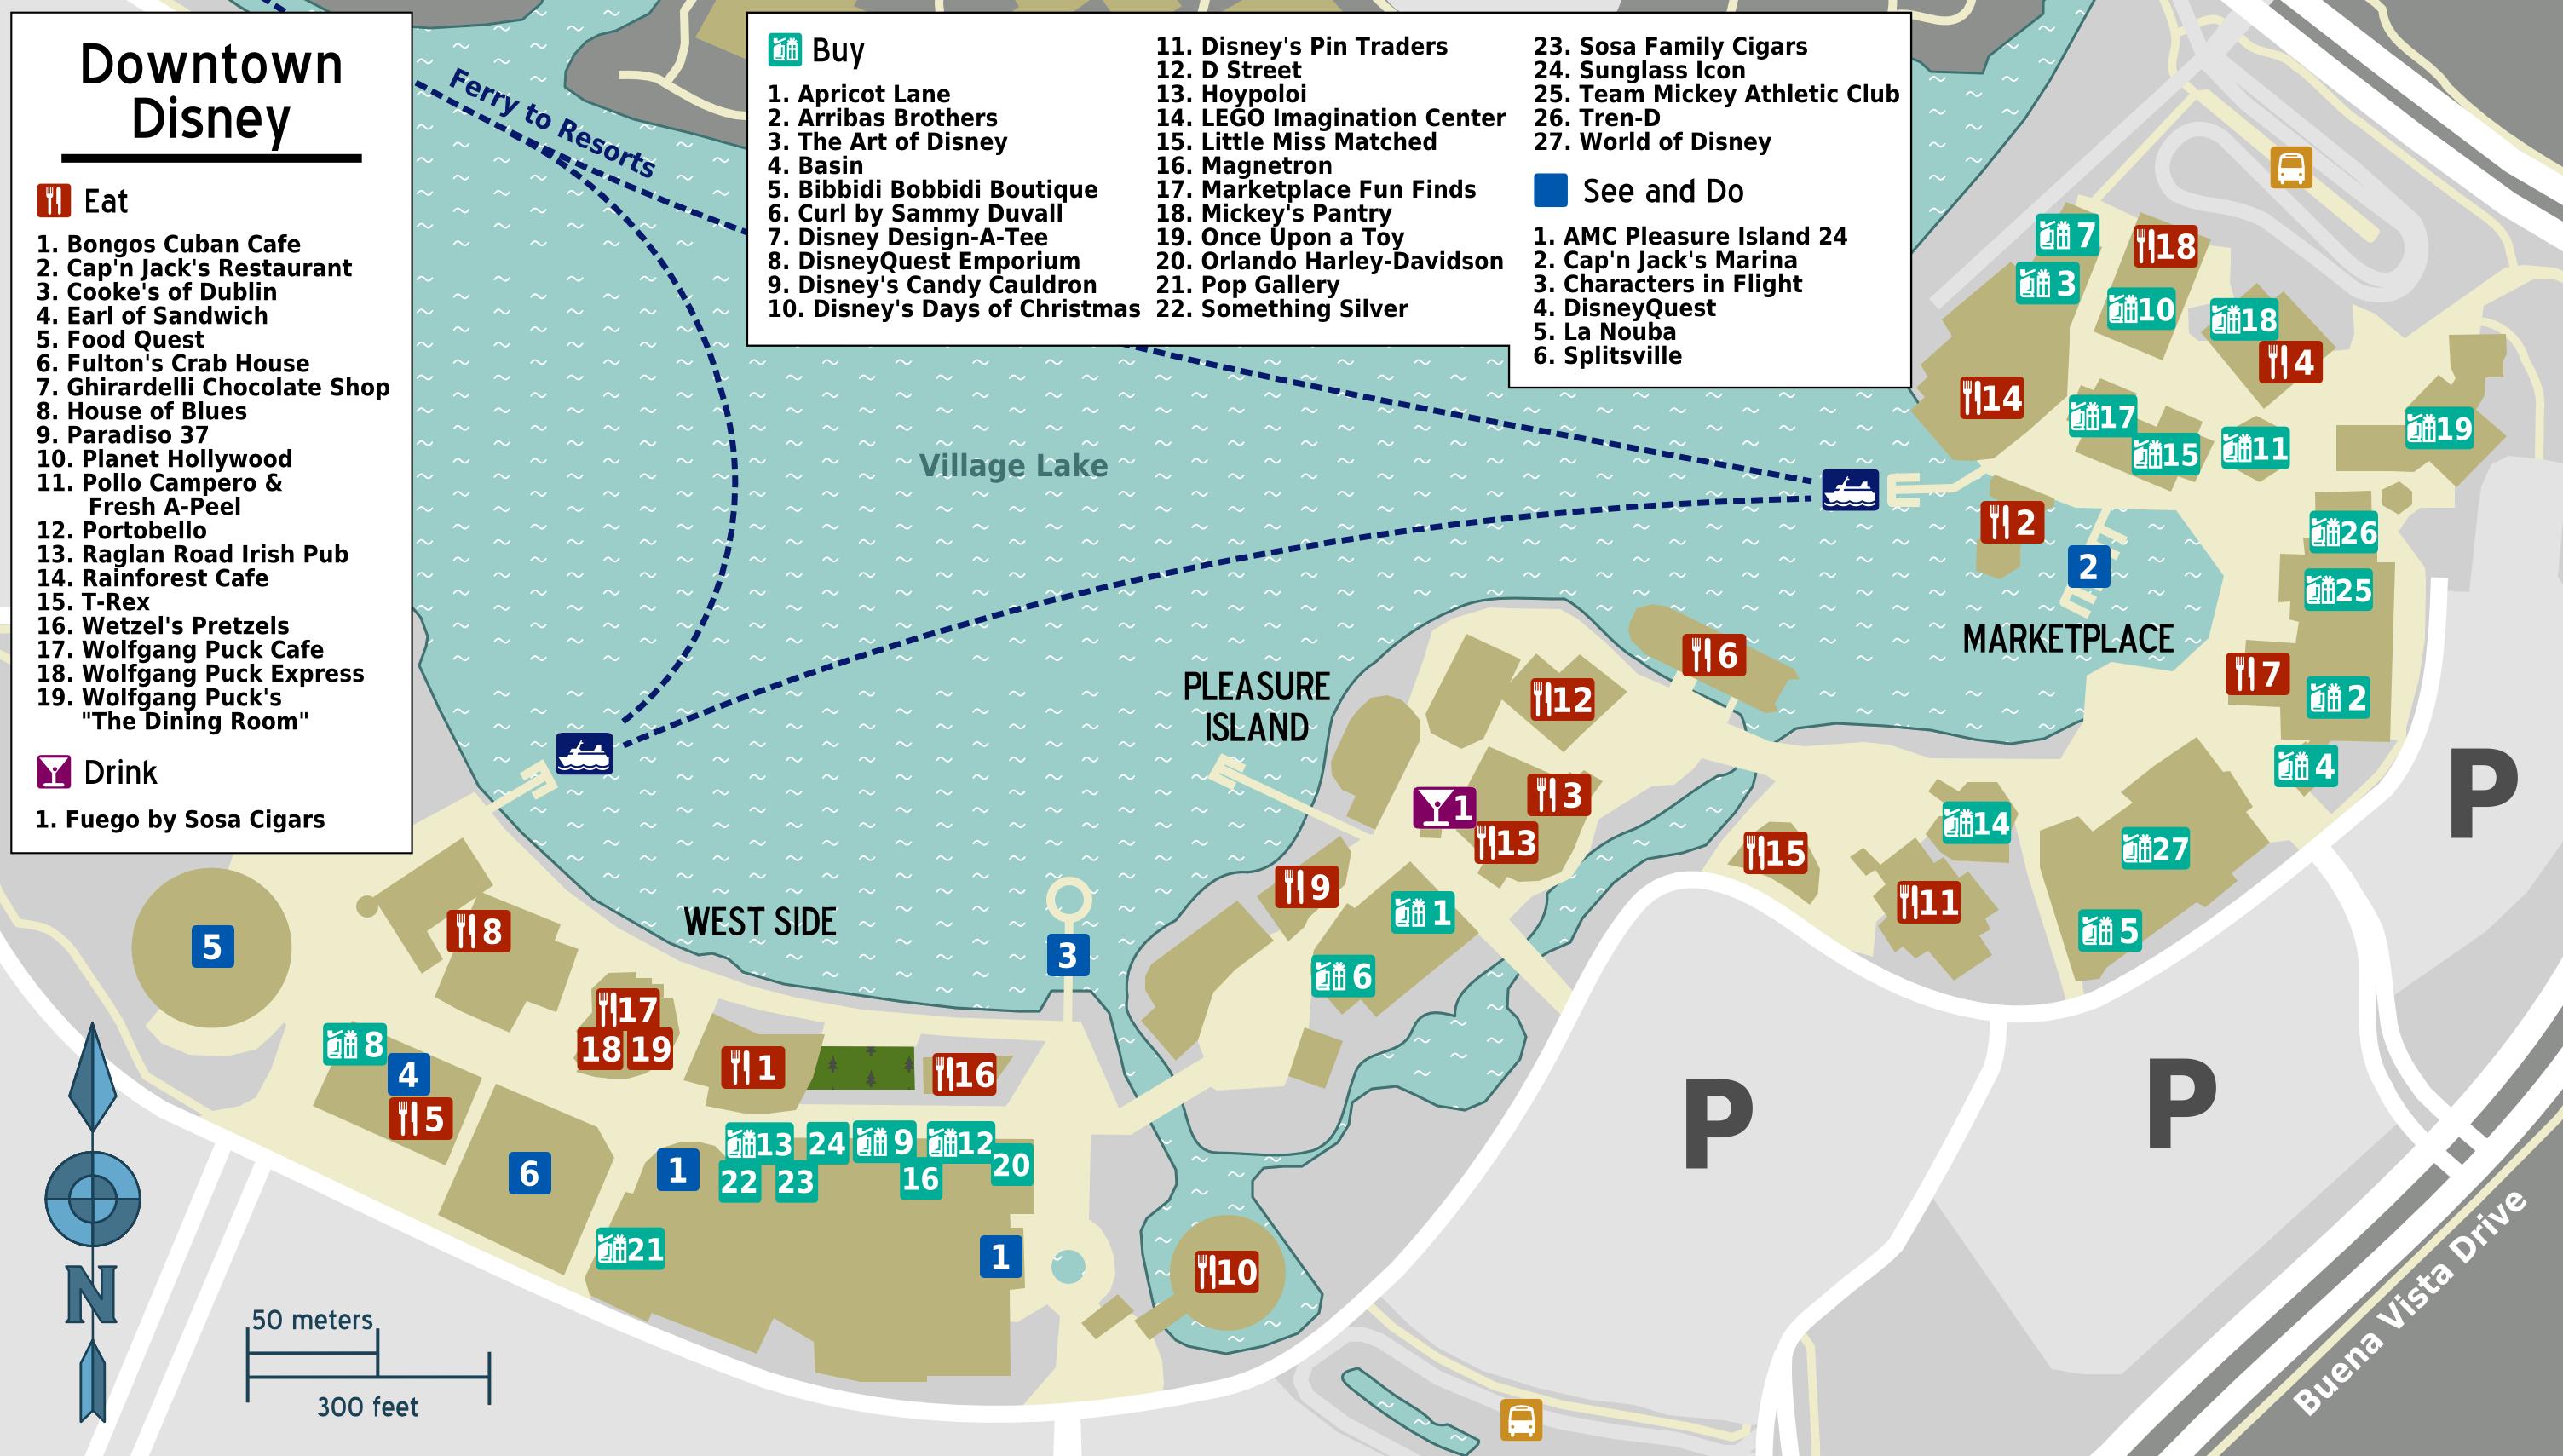 File:Map - Walt Disney World - Downtown Disney.png ... on disney springs map, lake buena vista map, magic kingdom map, disney monorail map, disneyland map, disney boardwalk map, disney animal kingdom map, disney resort map, seaworld map, california adventure map, epcot map, disney channel map, discovery cove map, disney parks map, typhoon lagoon map, disney quest map, anaheim map, disney world map, orlando map, disney area map,